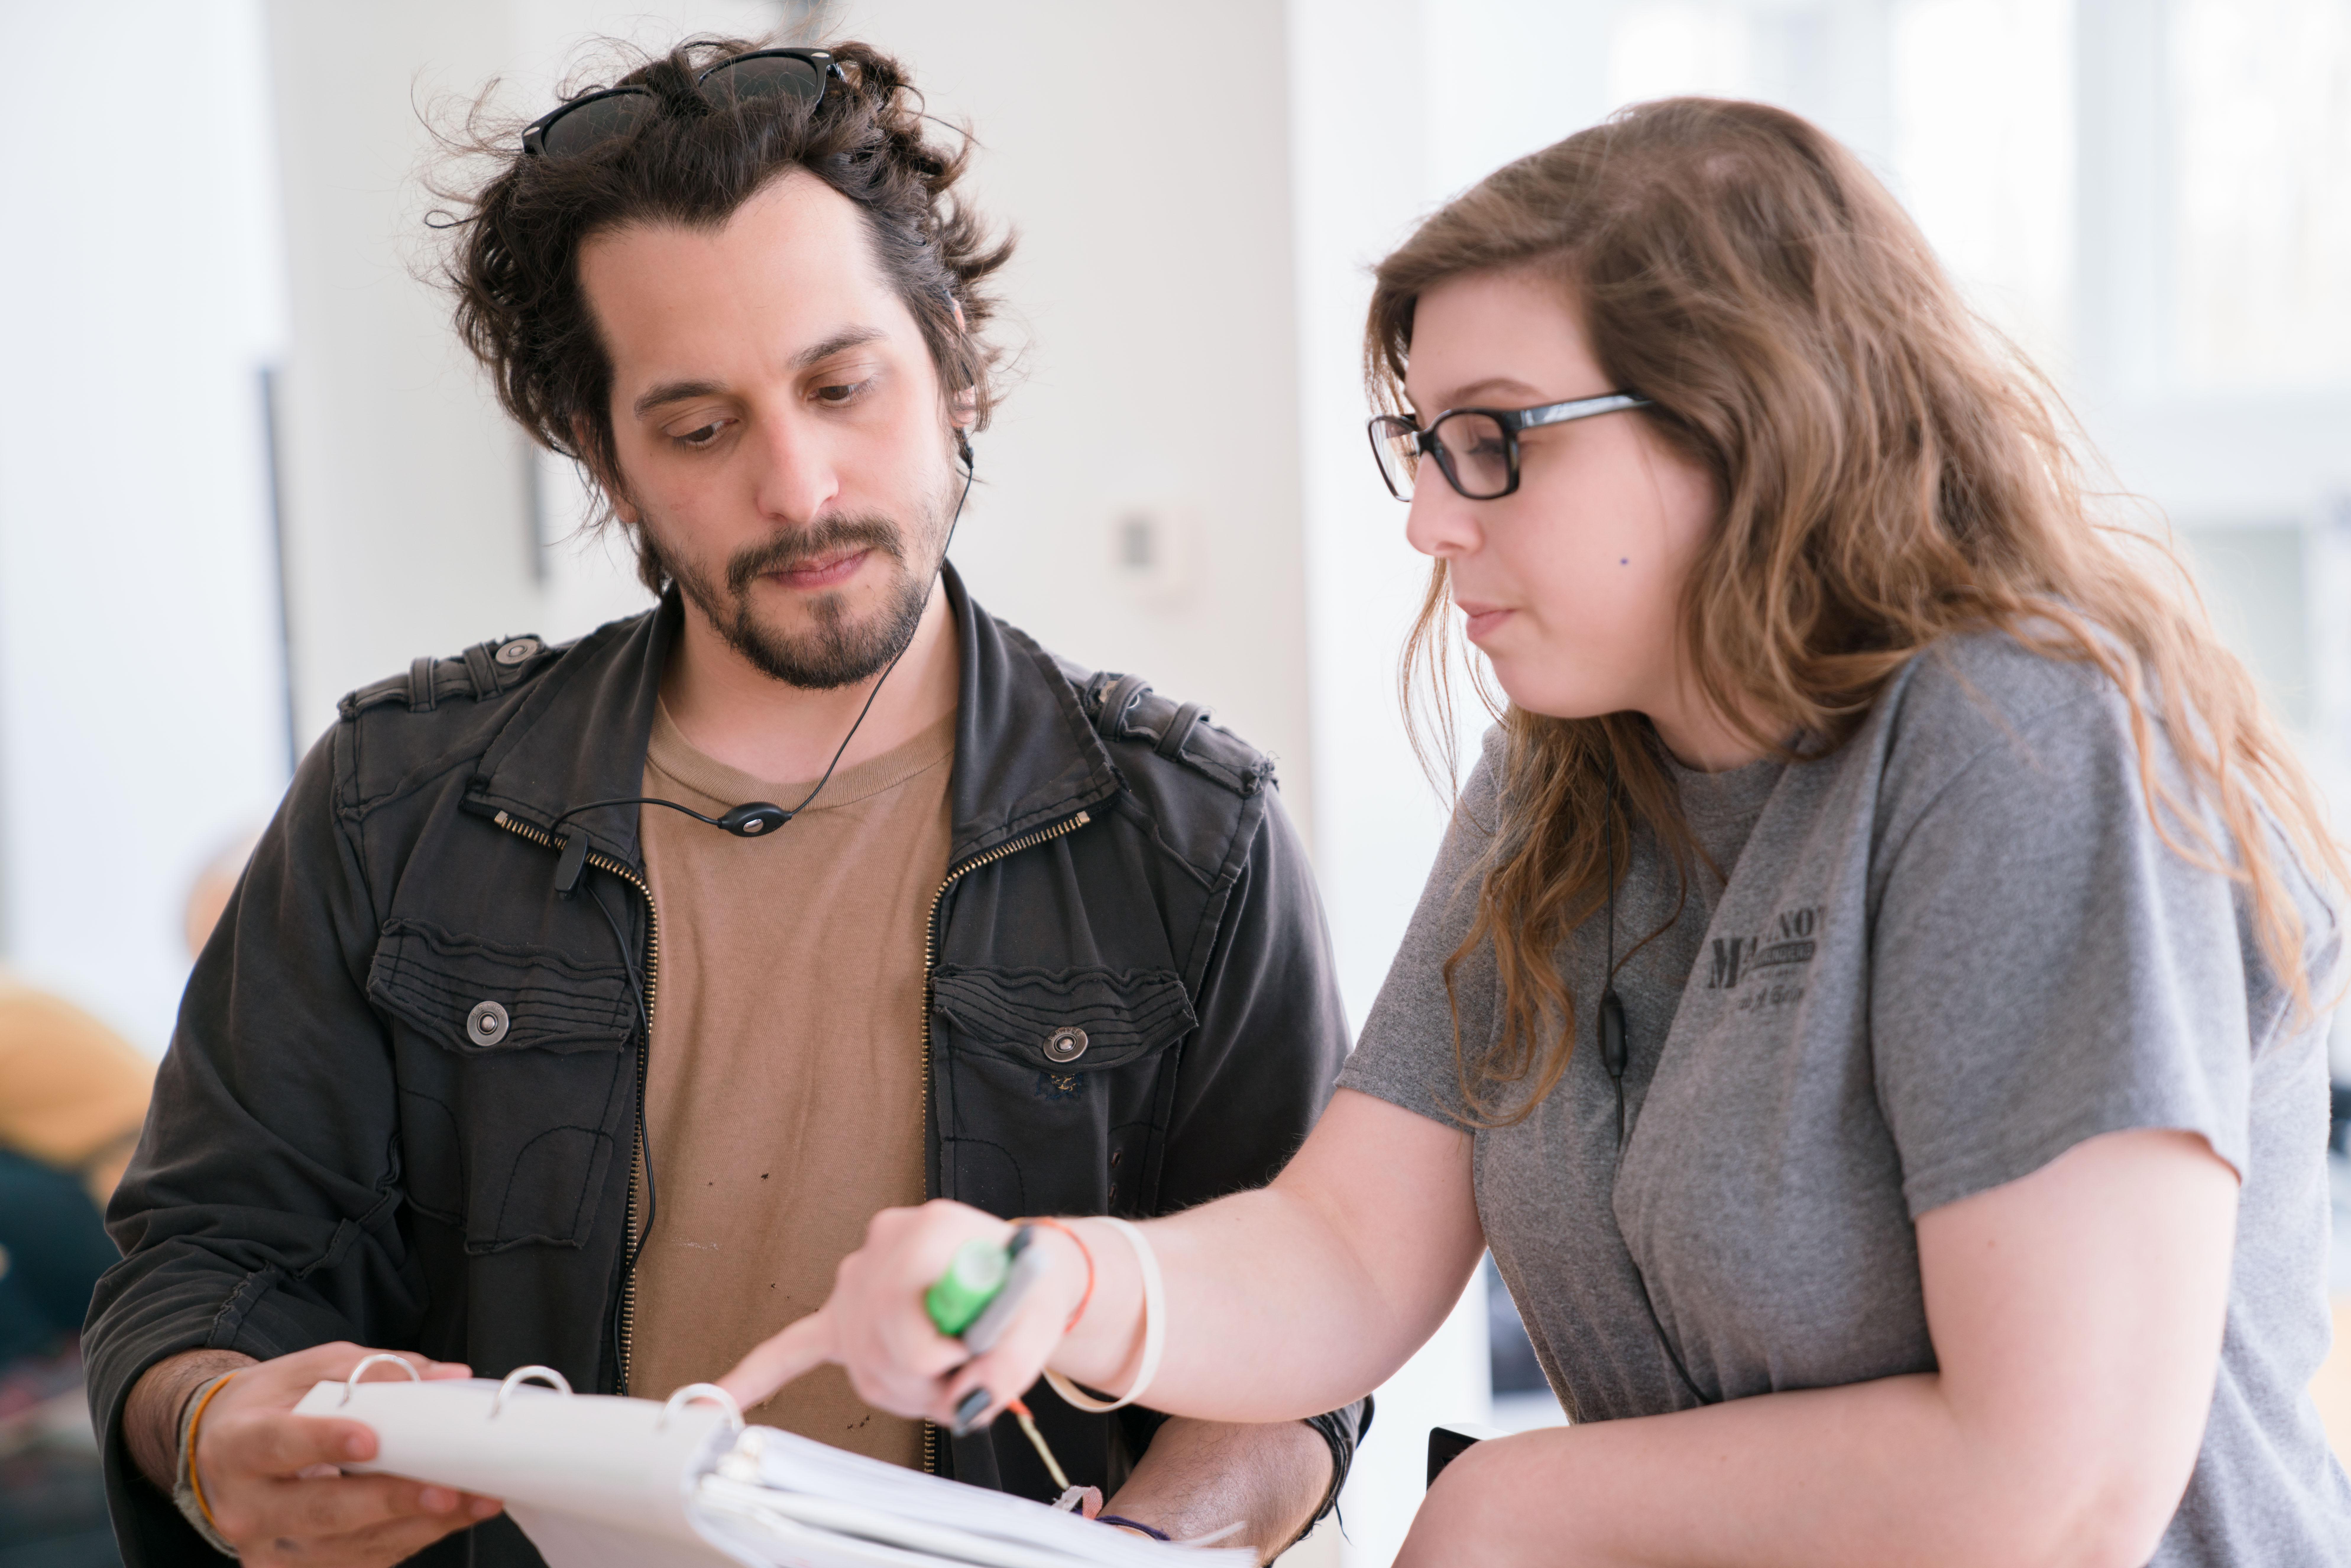 Jac Kessler & Abigail Urbik